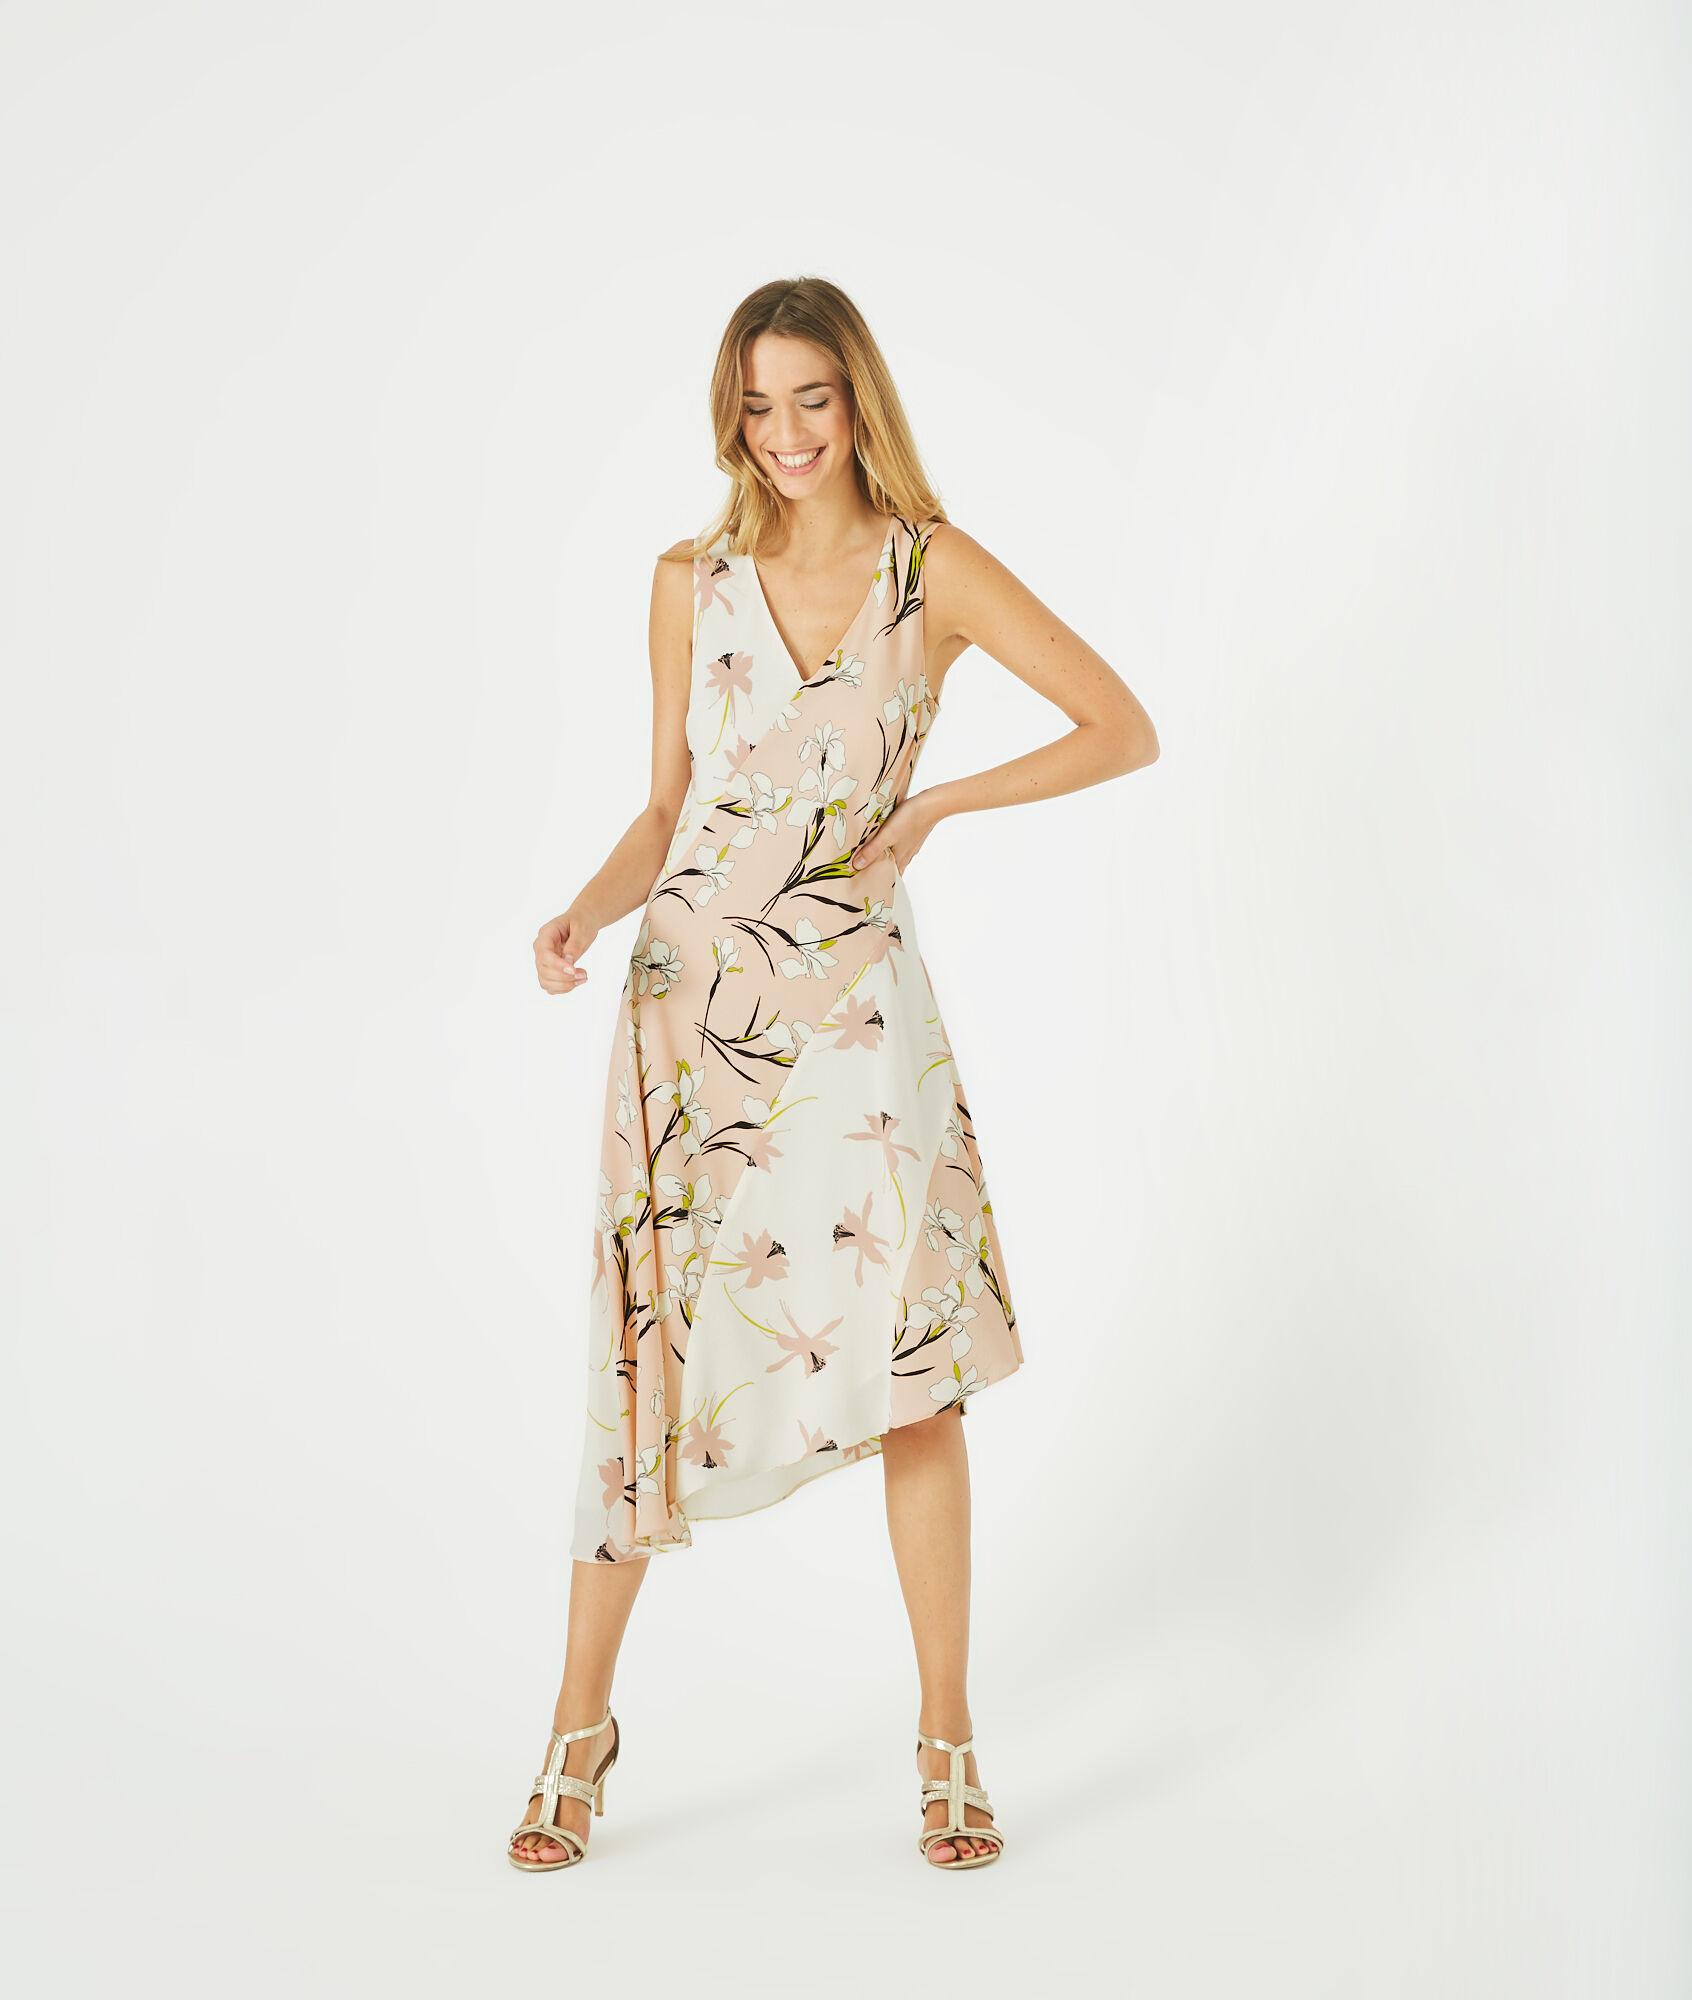 Magasin robe de cocktail royan